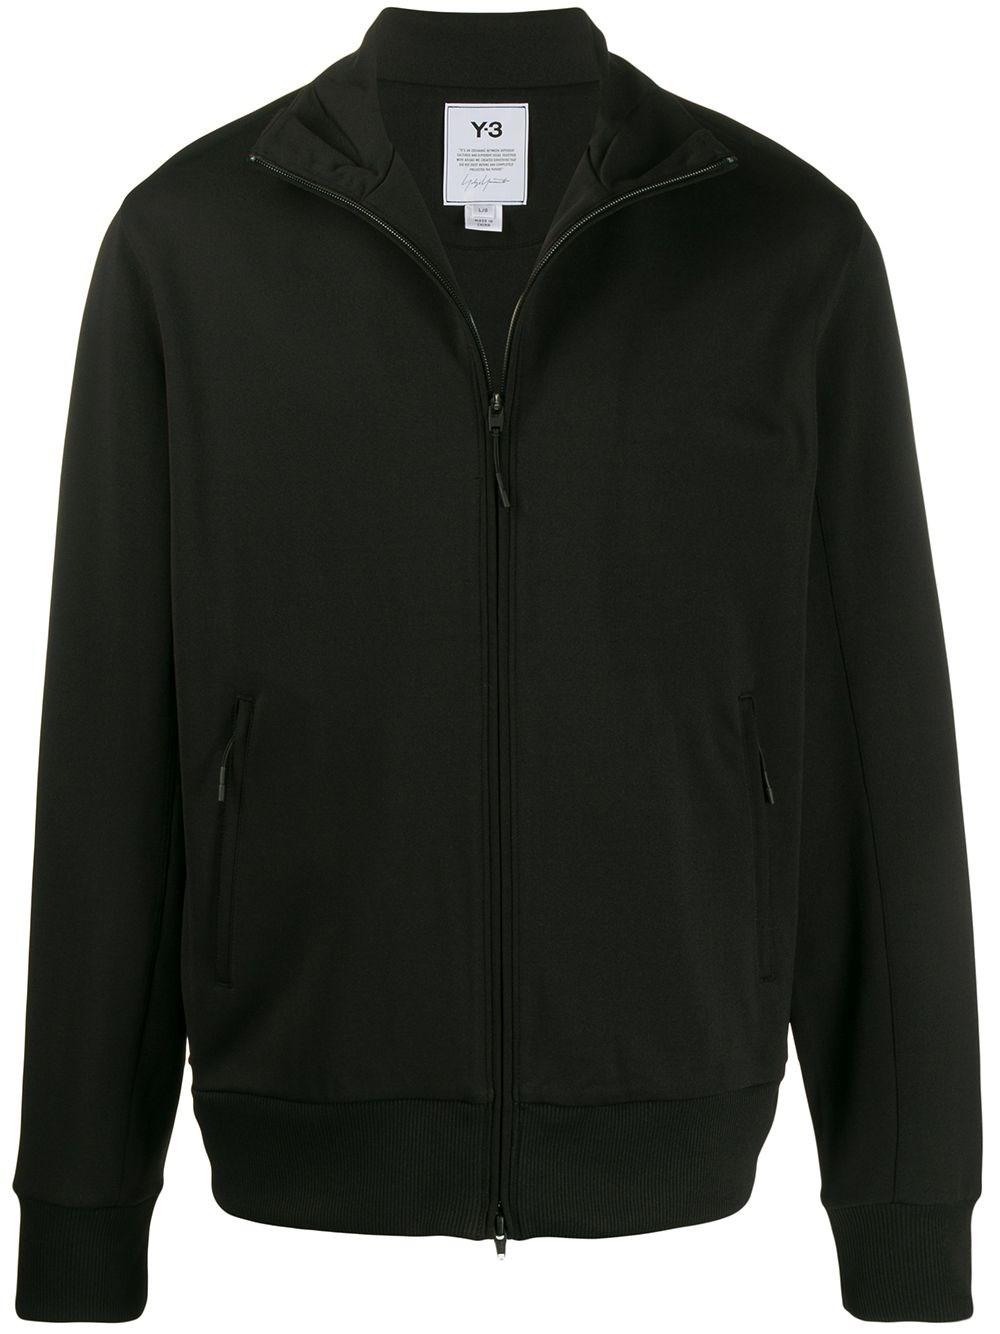 ADIDAS Y-3 Black Zipped Jacket